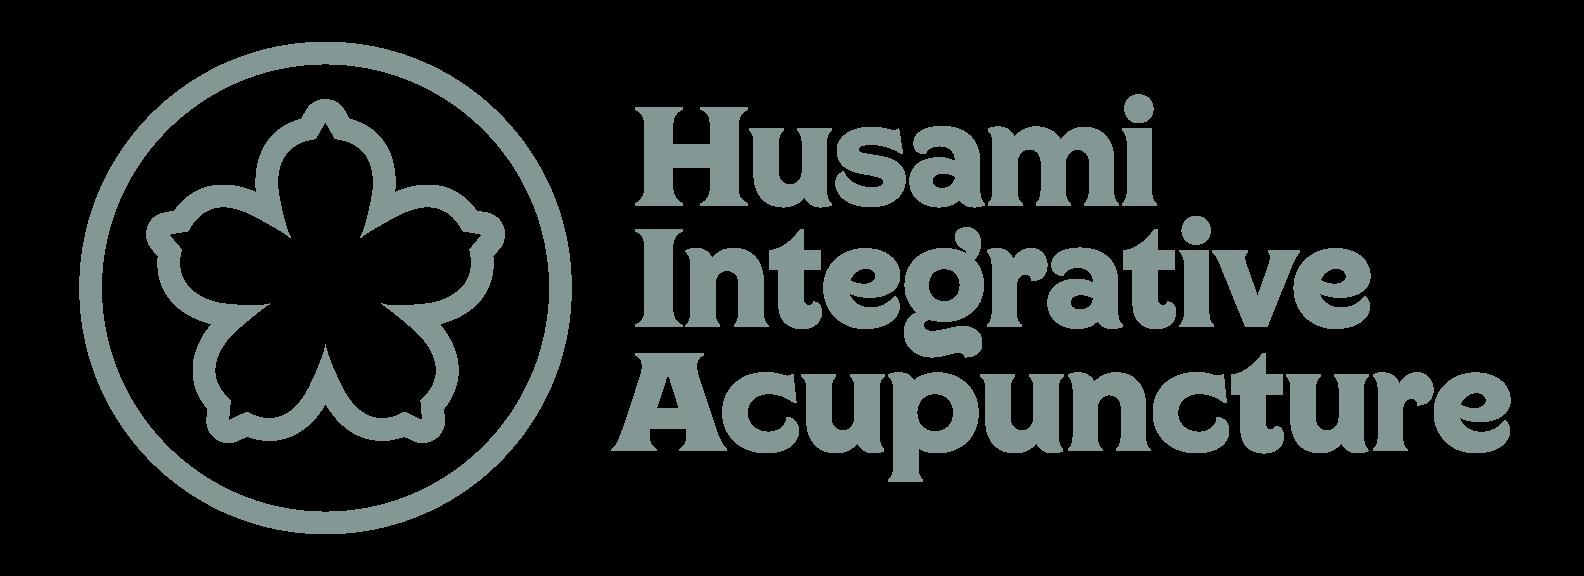 Husami-Logo-PMS.png